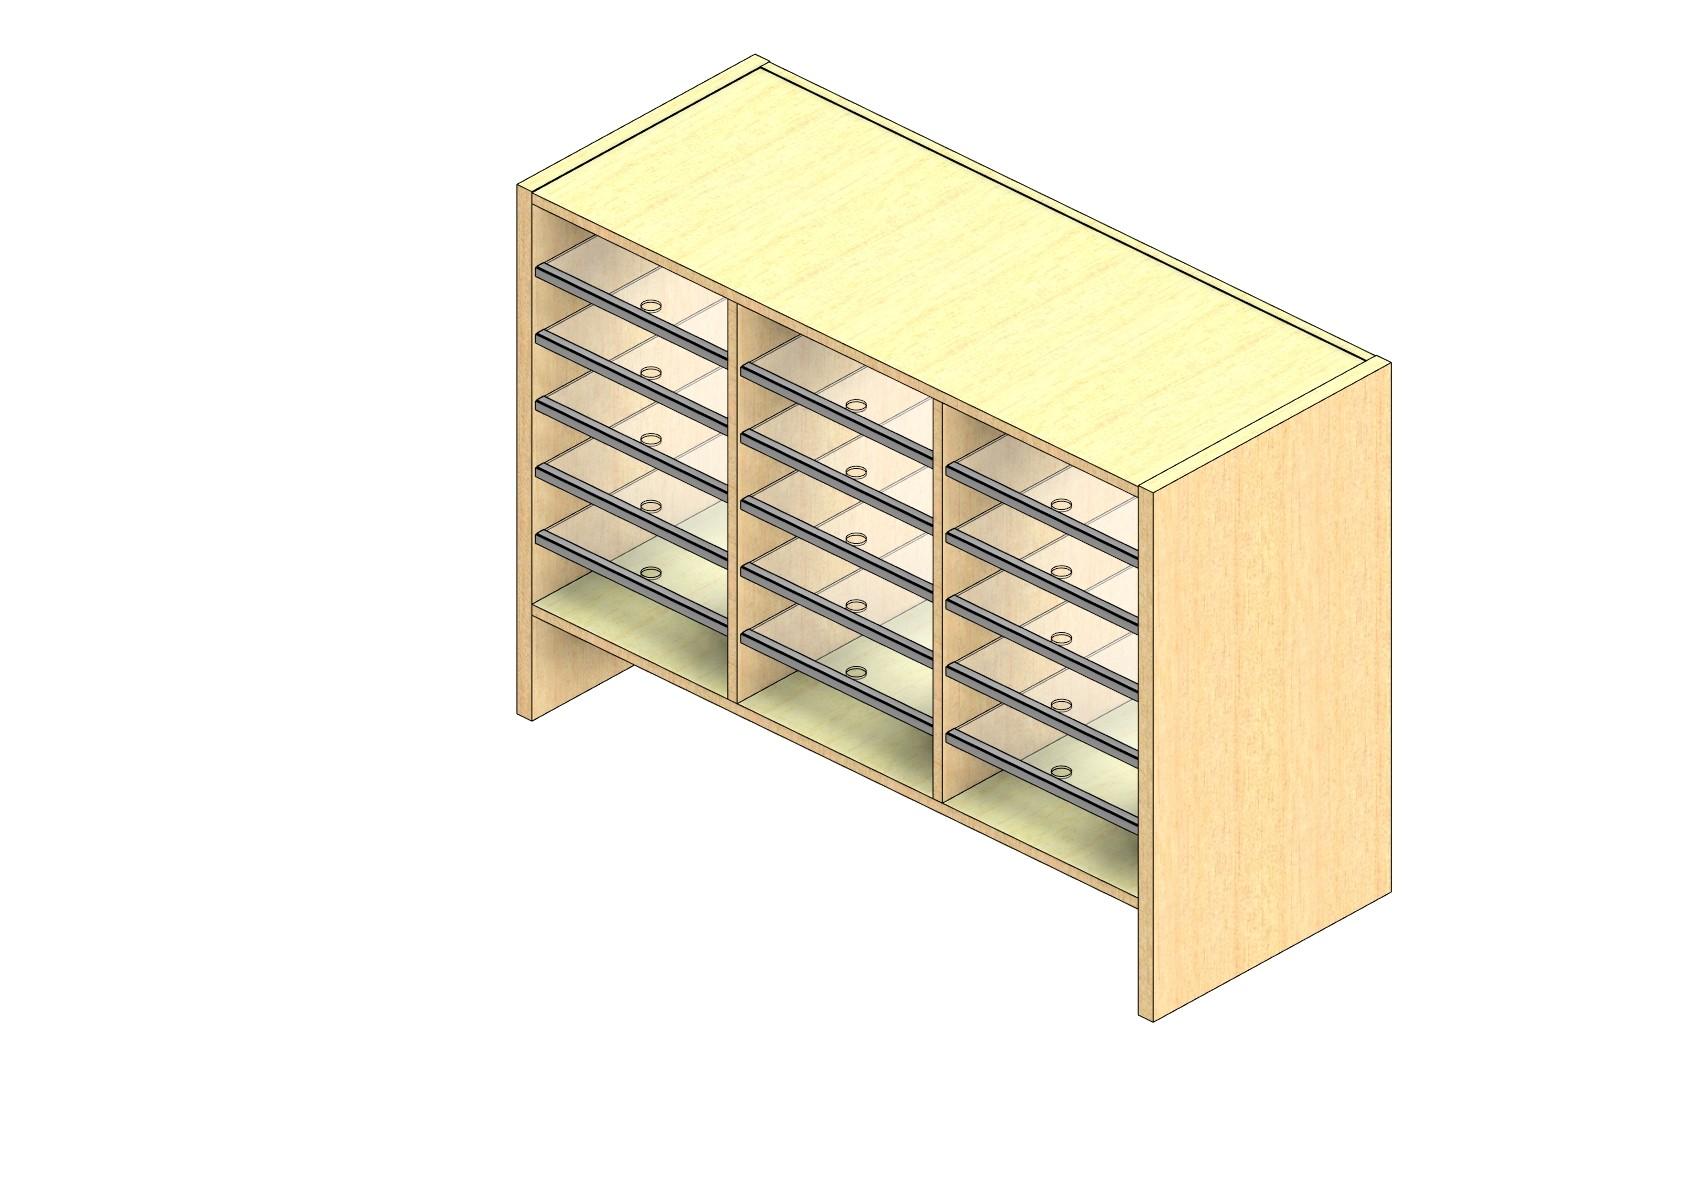 "Oversize Sized Plexi Back Sort Module - 3 Columns - 24"" Sorting Height w/ 6"" Riser"